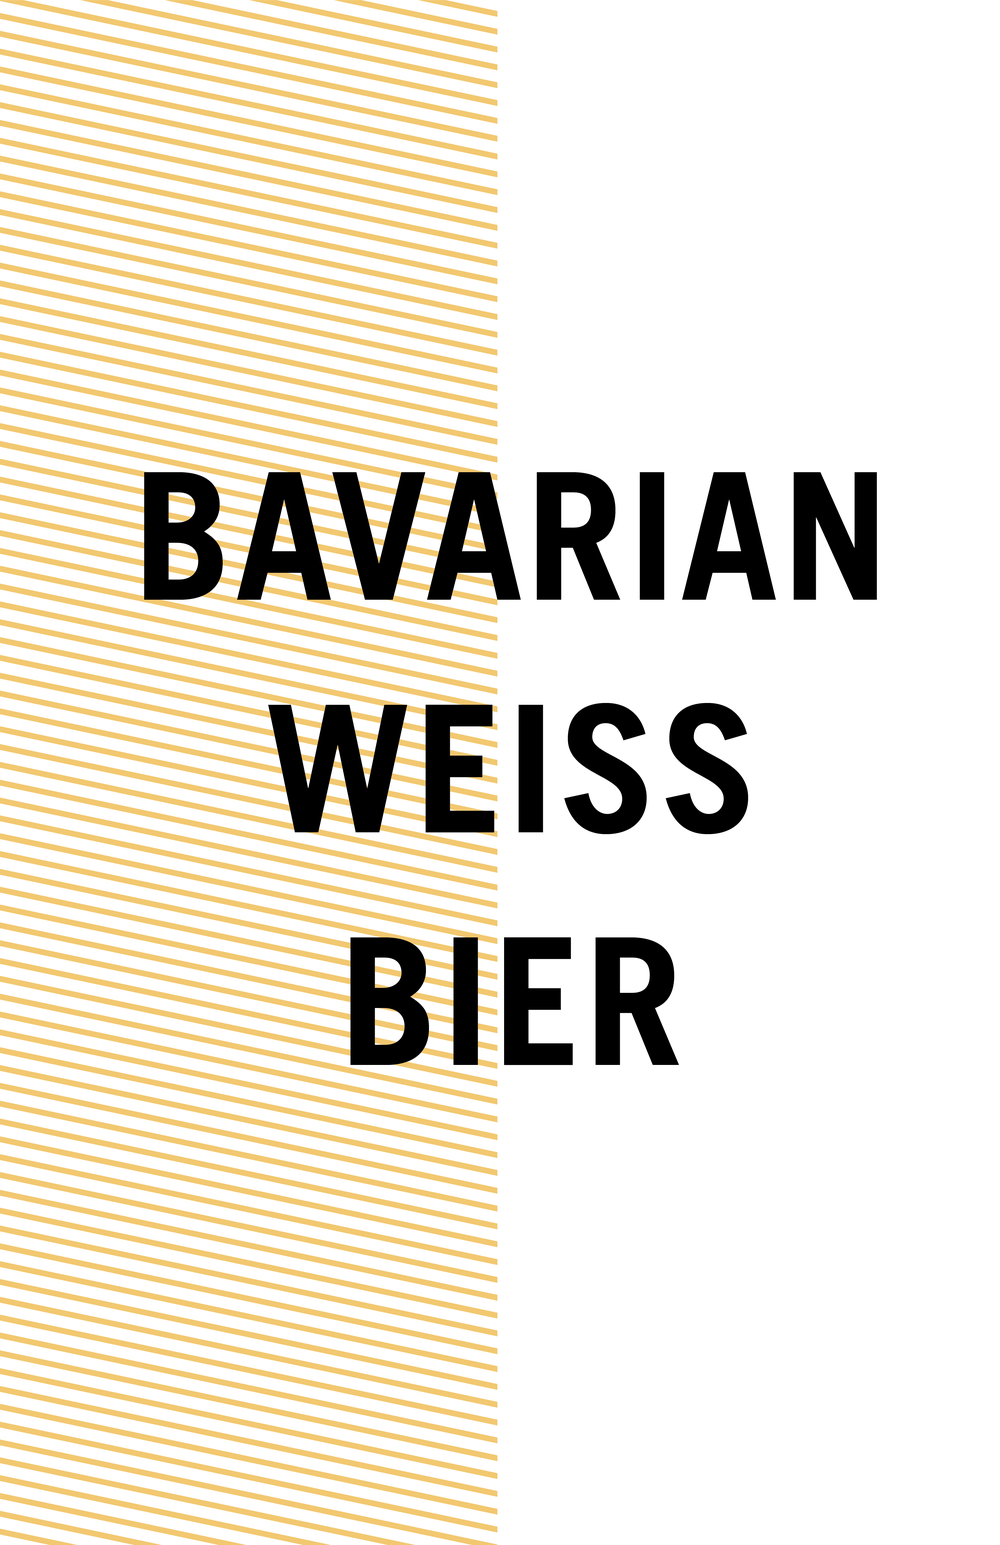 WeissBier-05.png